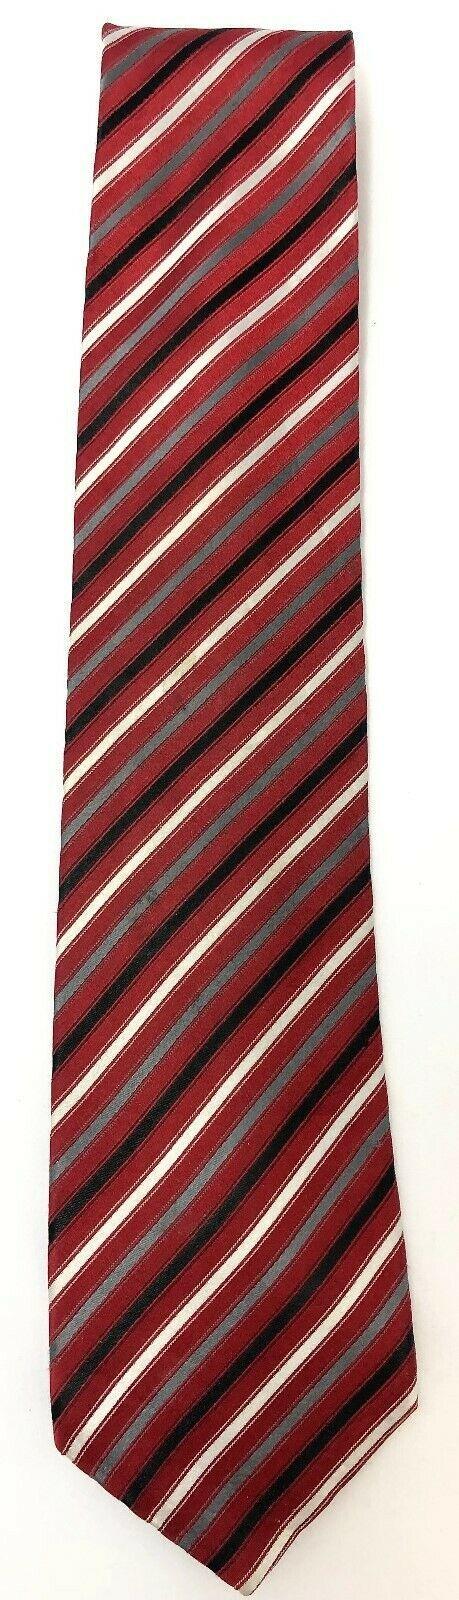 "NEW Geoffrey Beene 100% Silk Necktie Tie 59"" x 3-1/4""Handmade #235"